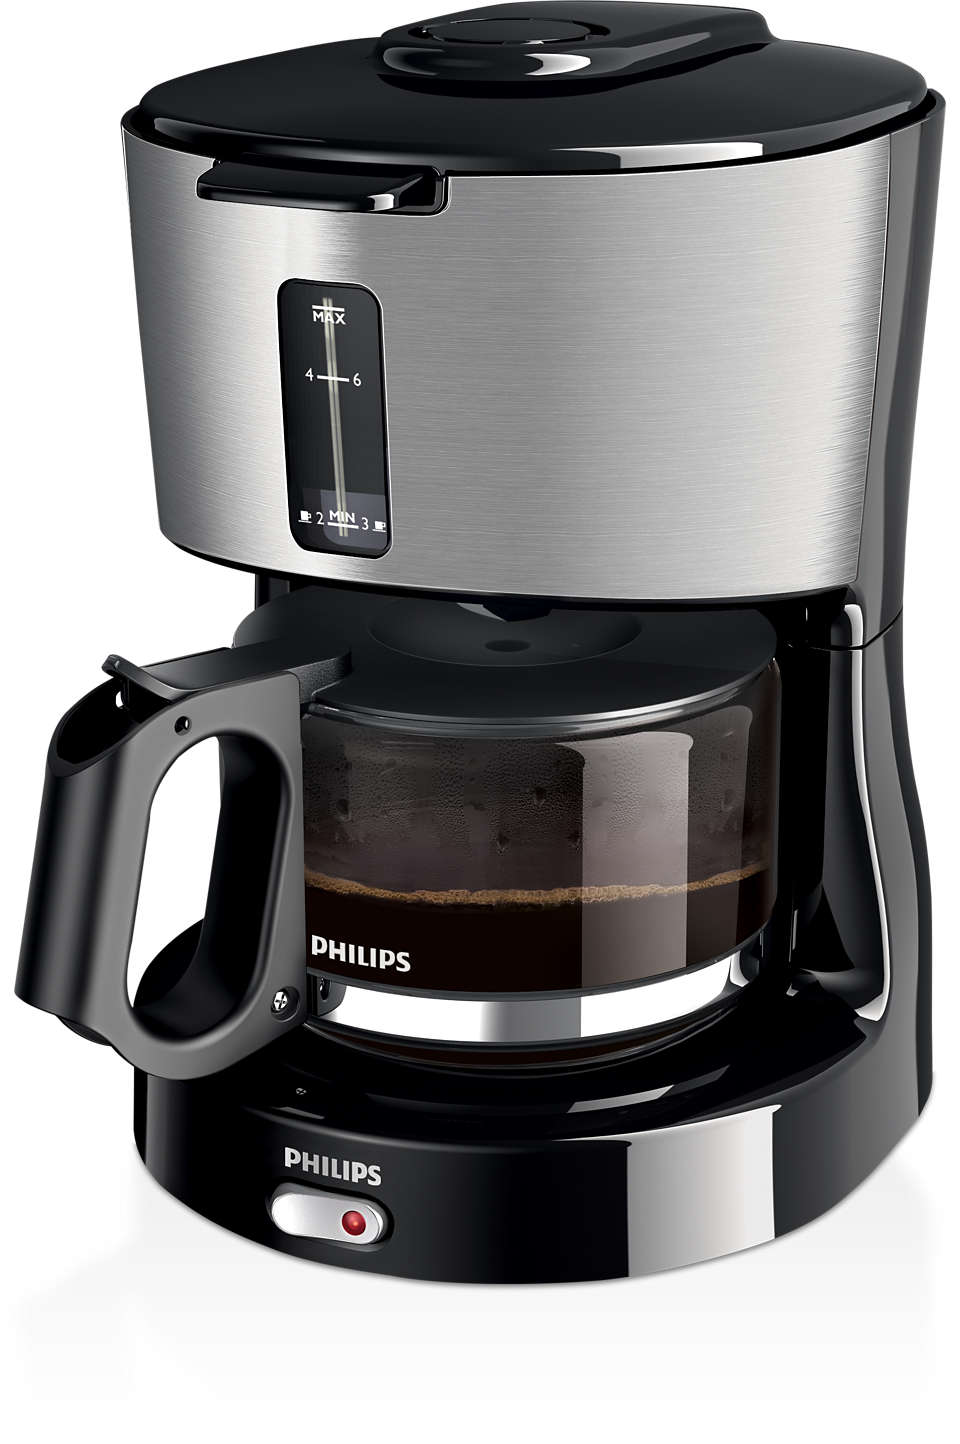 Good drip filter coffee, easily prepared